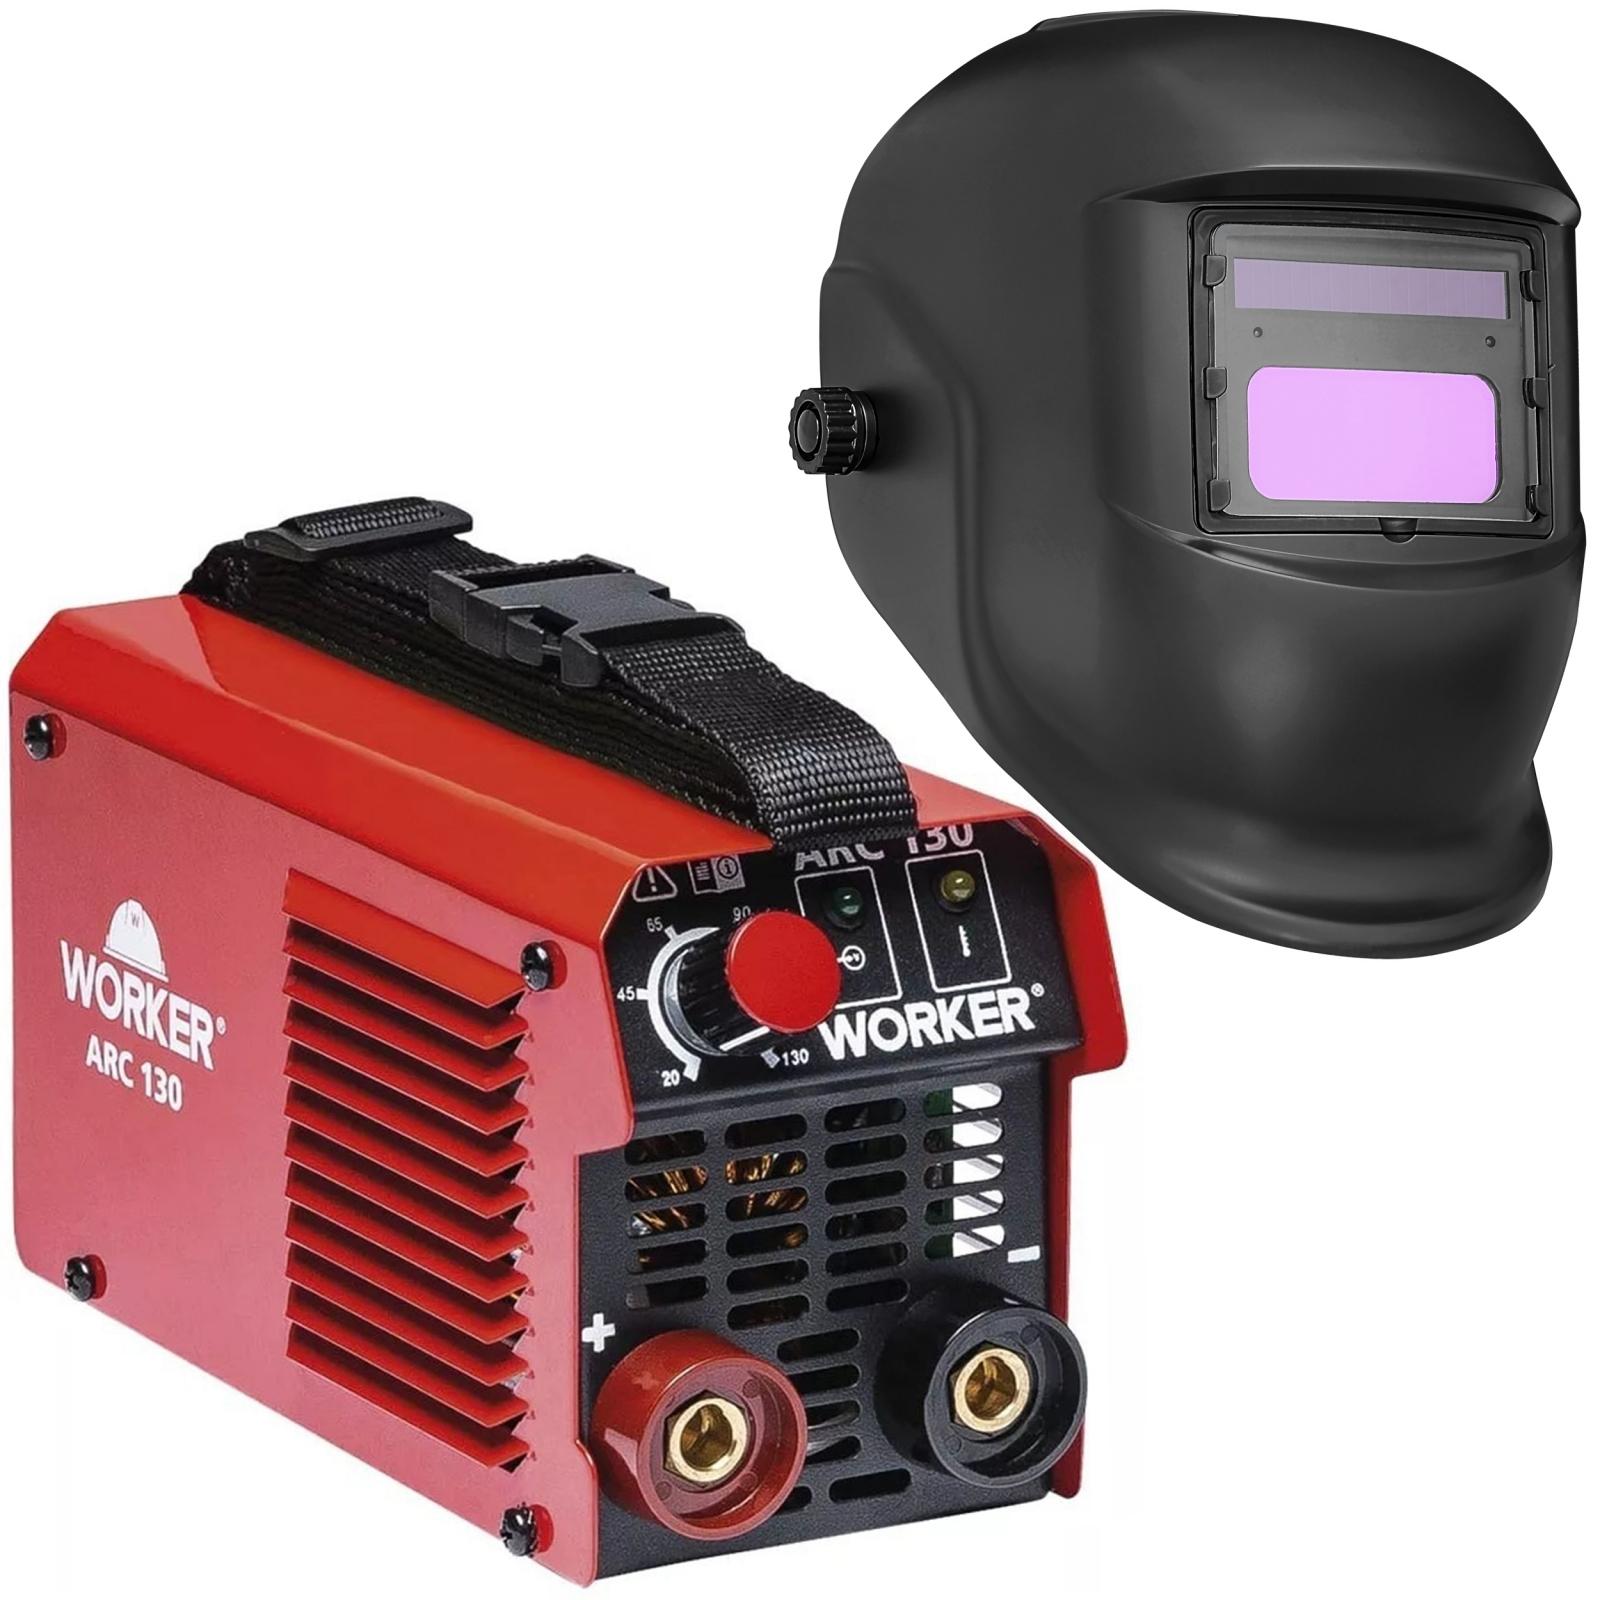 Máquina De Solda Inversora Arc 130 Worker + Mascara De Solda Solar Eletrônica - Ferramentas MEP